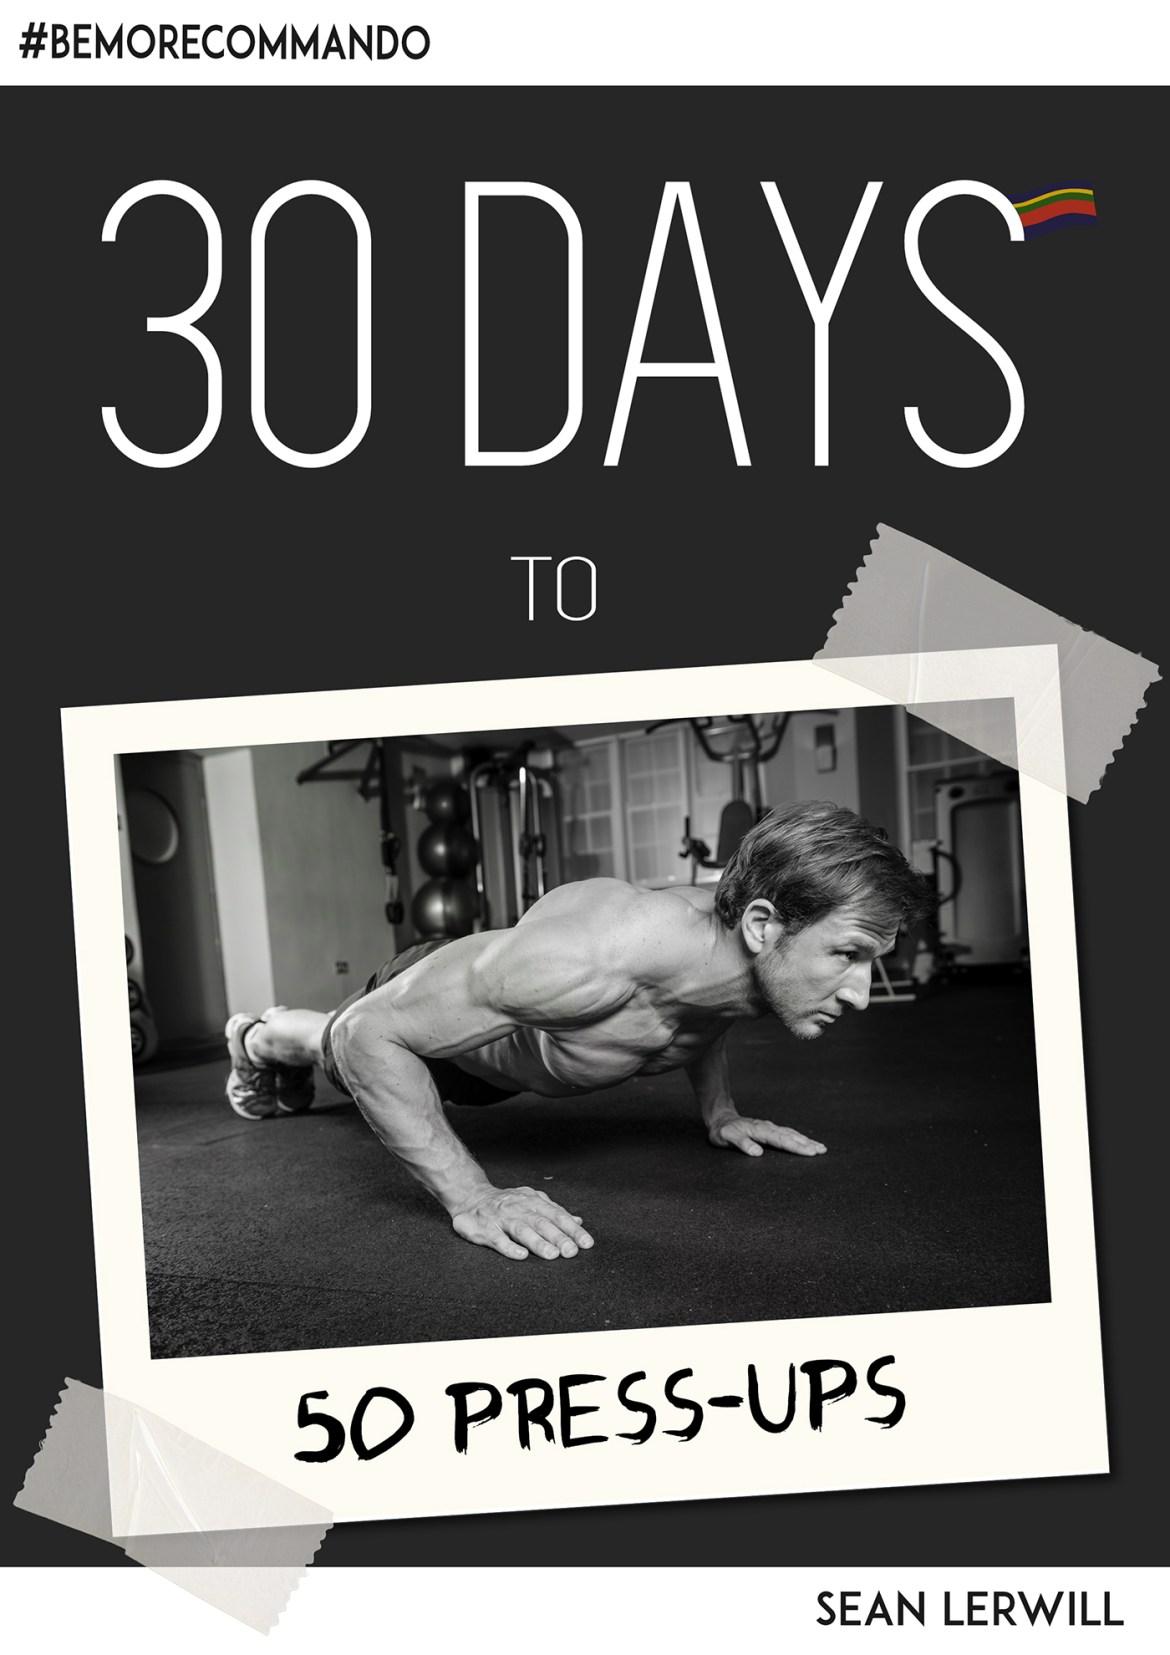 30 Days to 50 Press-ups